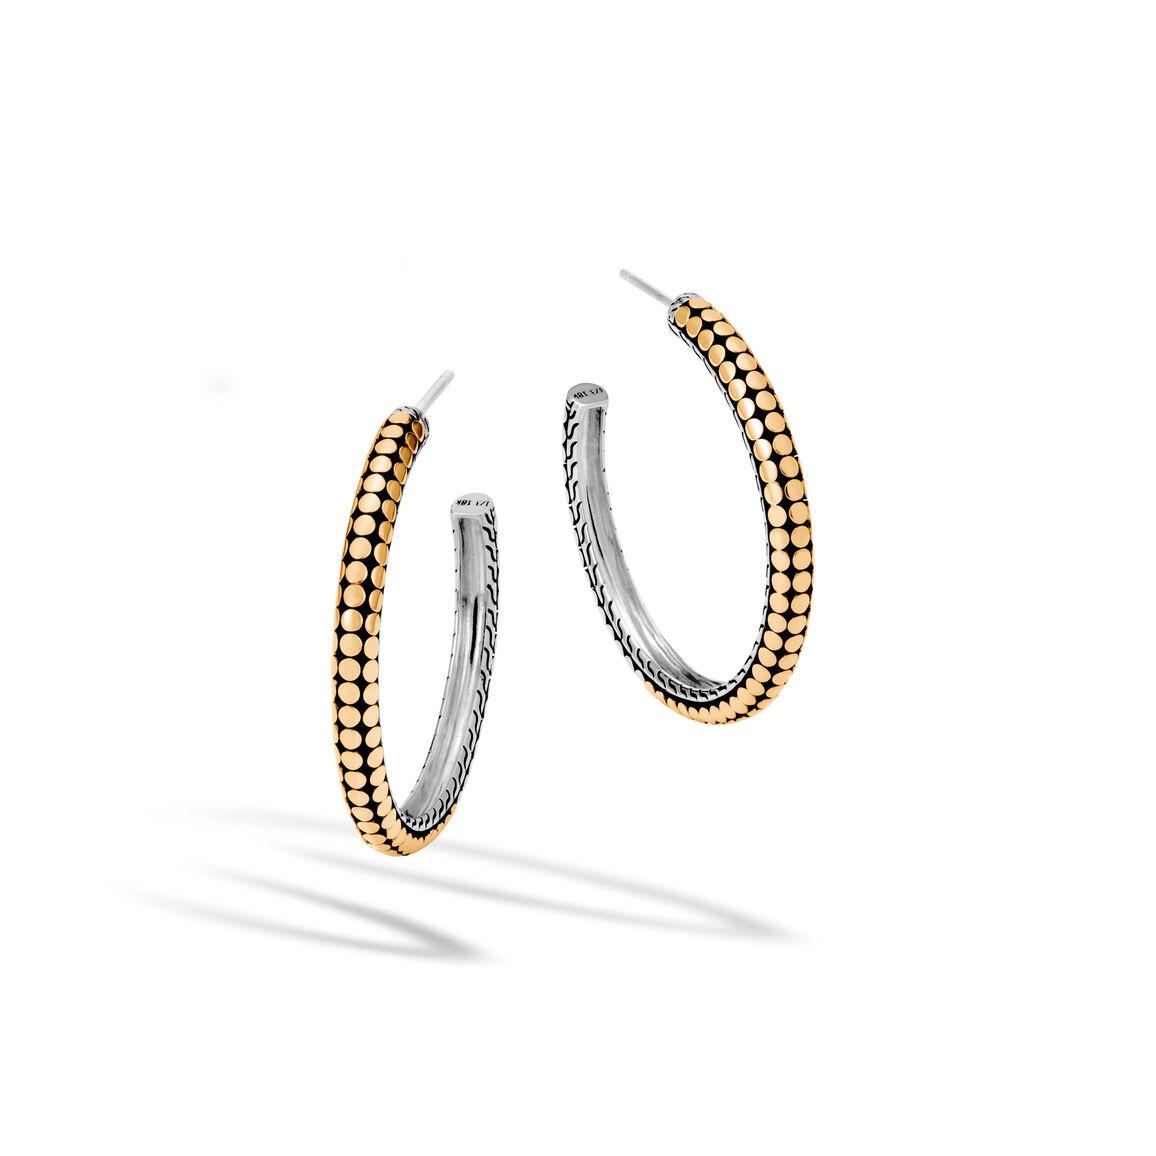 Dot Medium Hoop Earring in Silver and 18K Gold